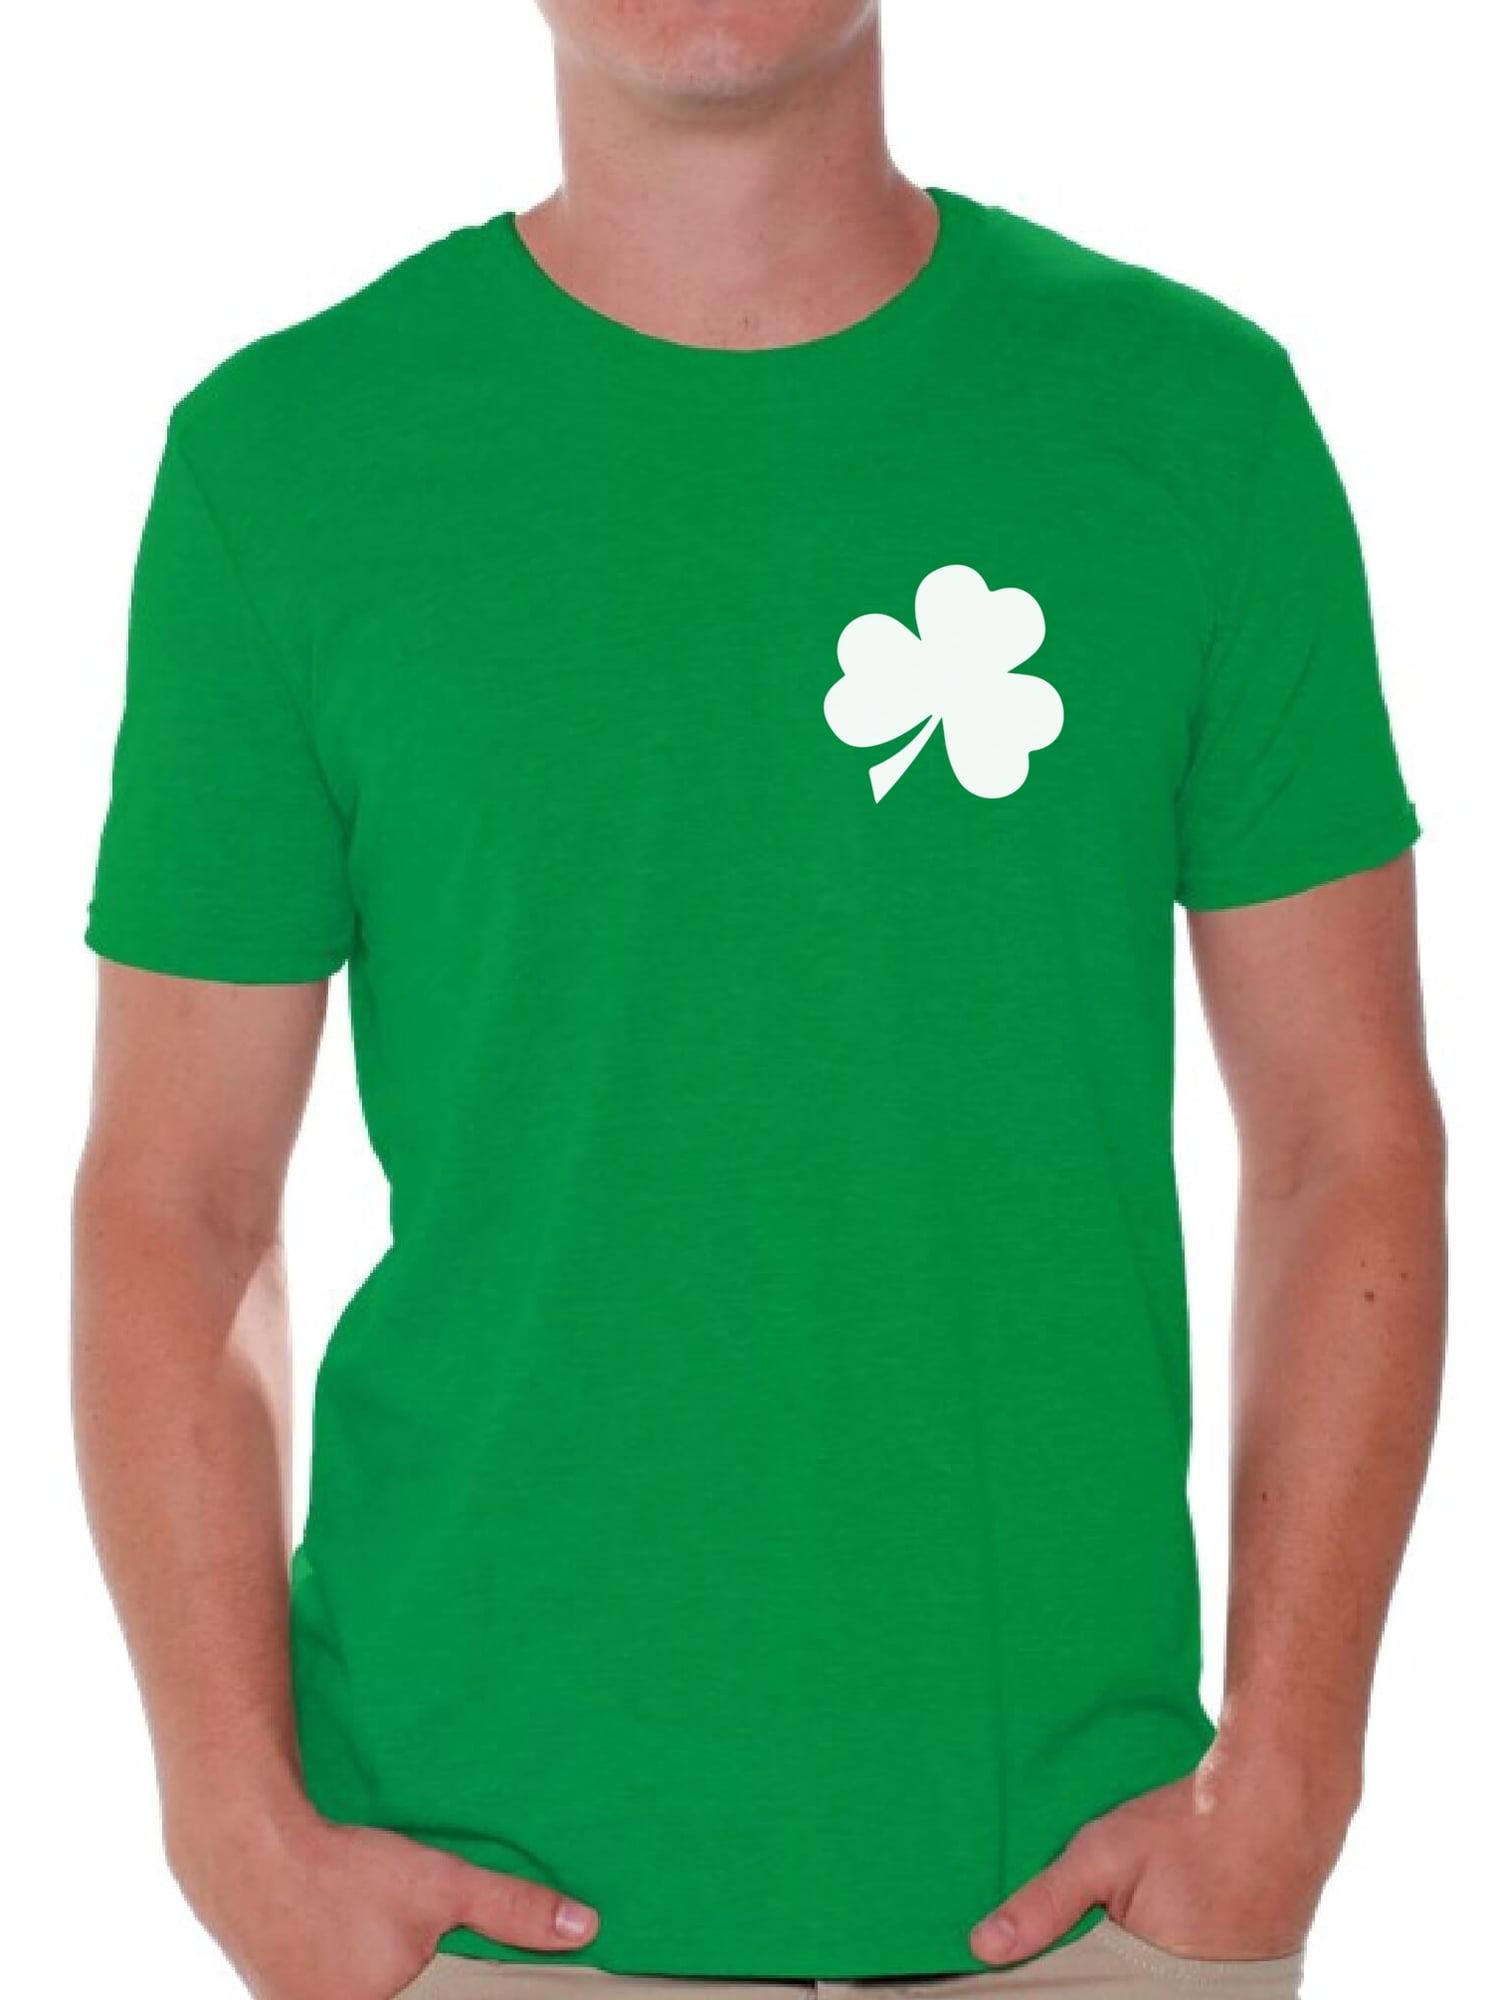 dbc4a86a8 Awkward Styles Shamrock Pocket Size Shirt Shamrock Green T-Shirt for Men  Men's St. Patrick's Day Shirts Lucky Charm Gifts Proud Irish American Men  Green ...